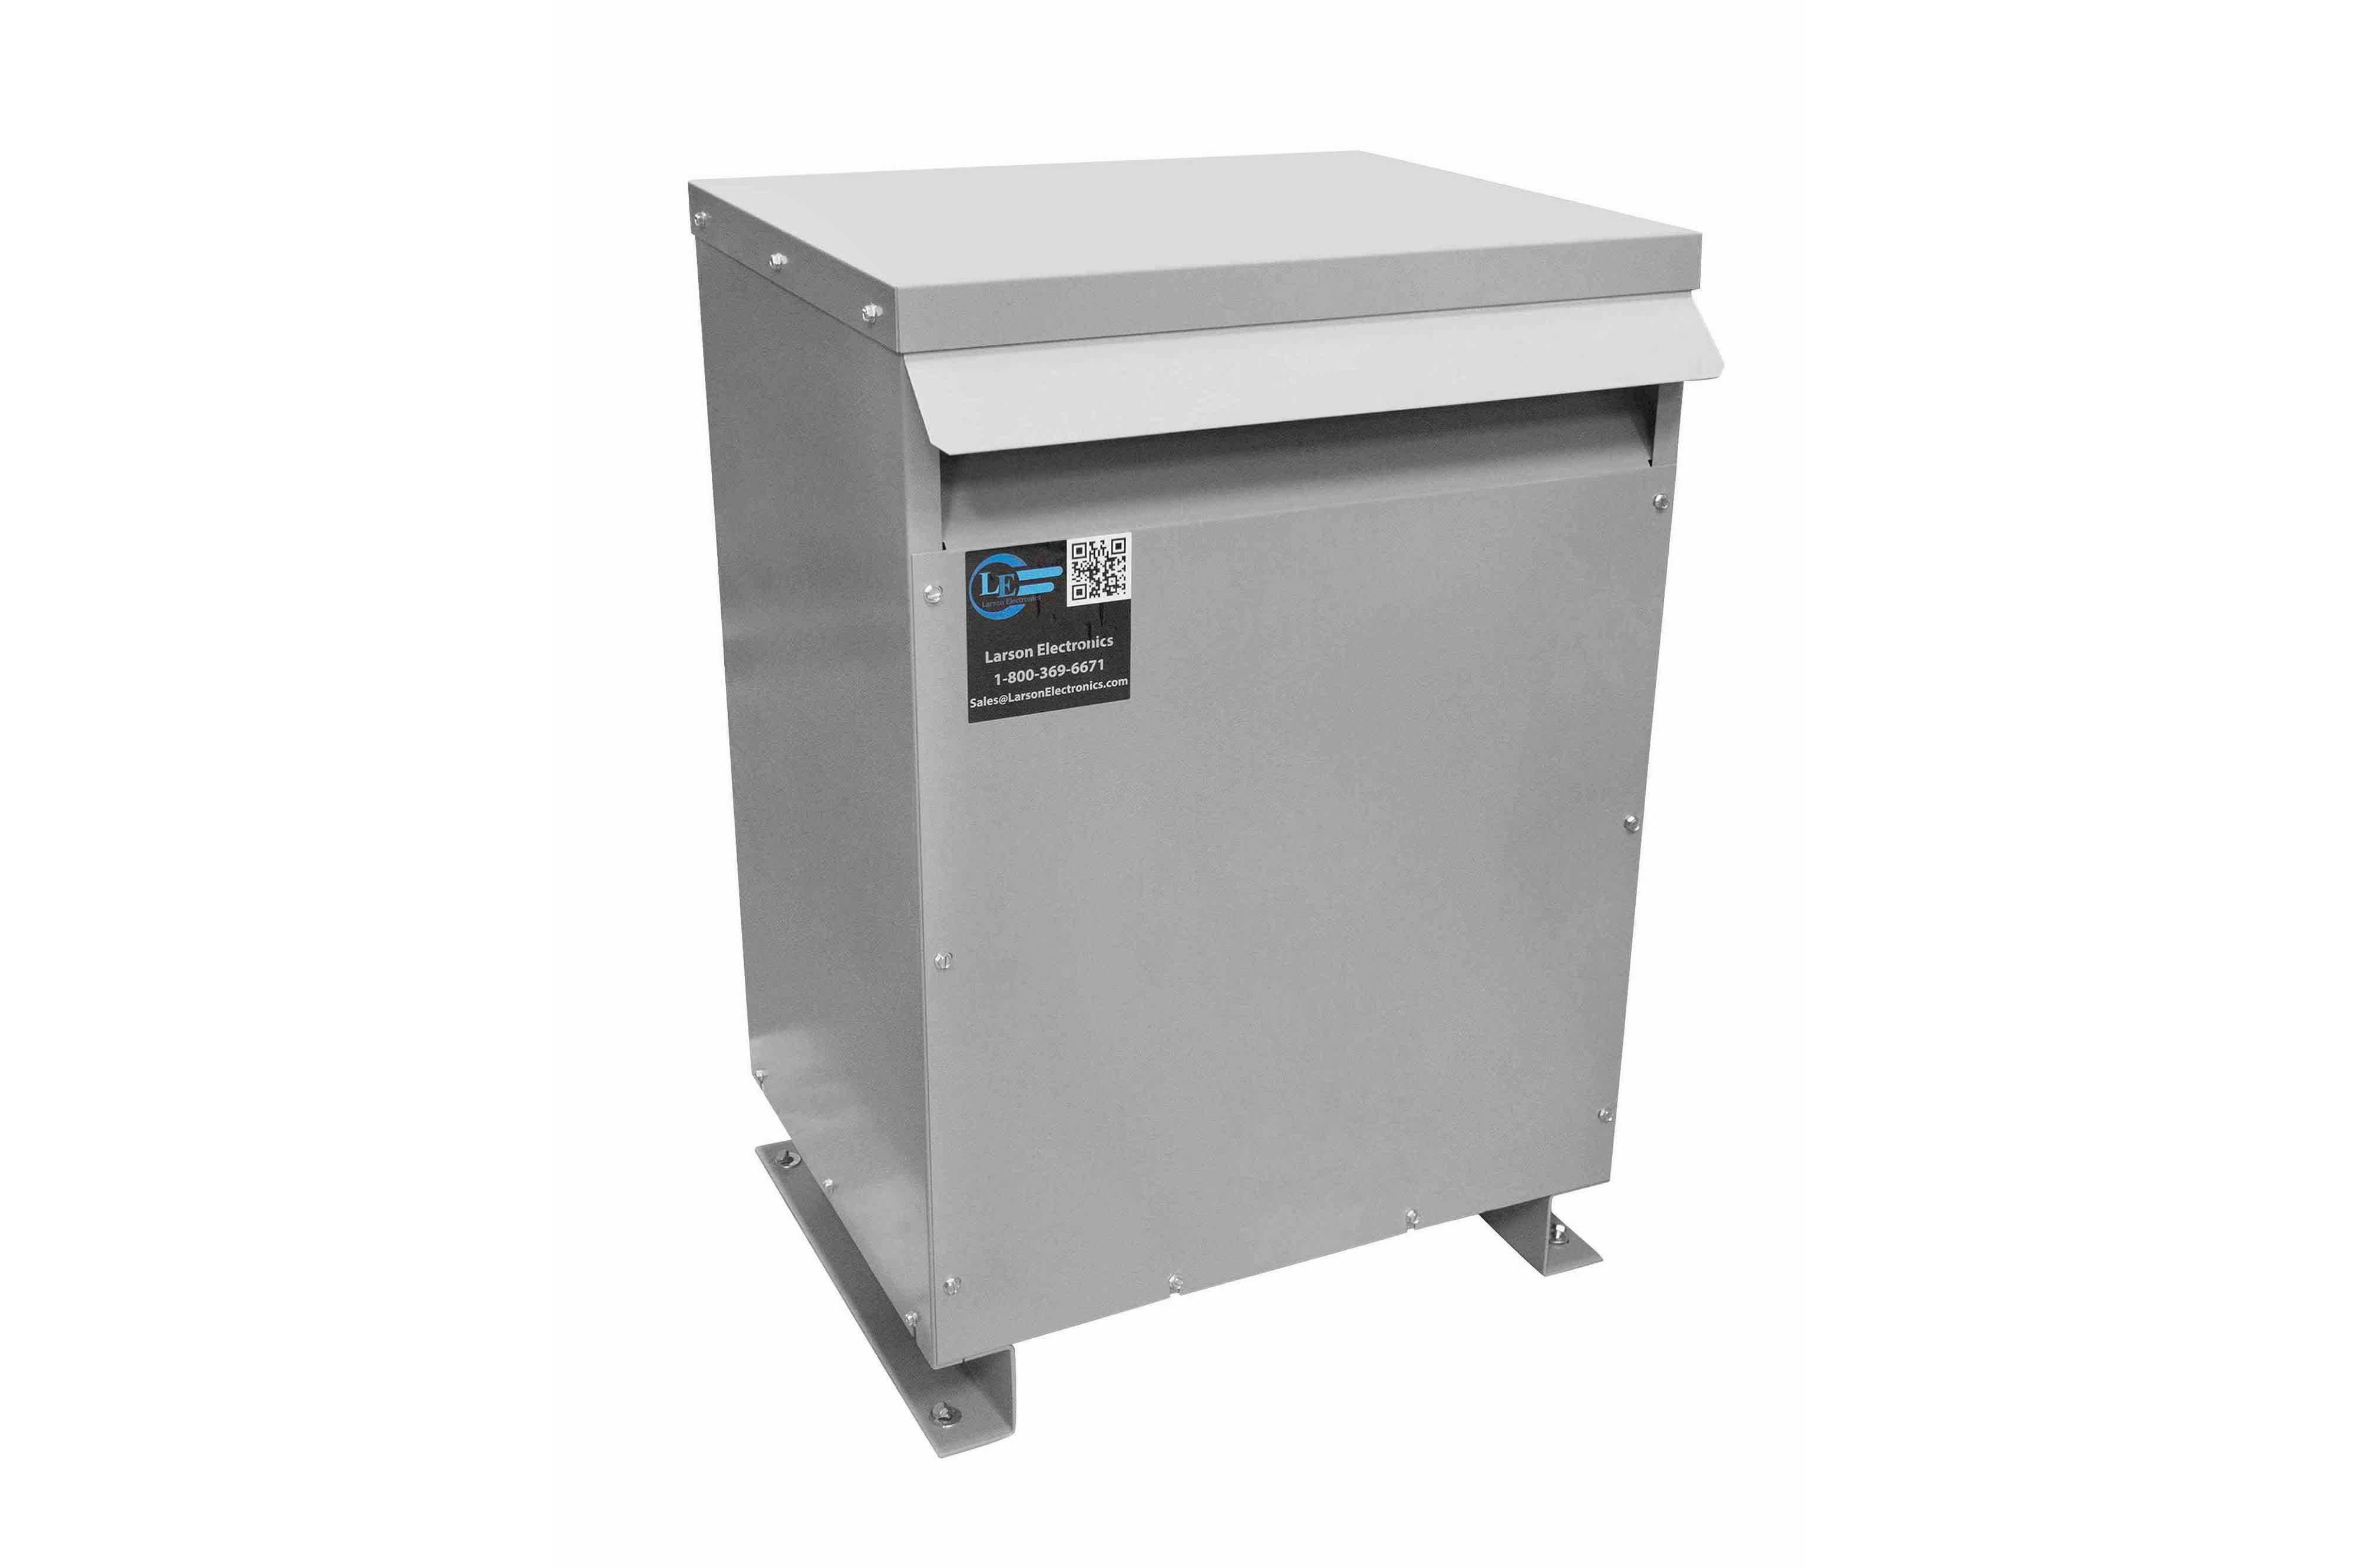 167 kVA 3PH DOE Transformer, 415V Delta Primary, 480Y/277 Wye-N Secondary, N3R, Ventilated, 60 Hz